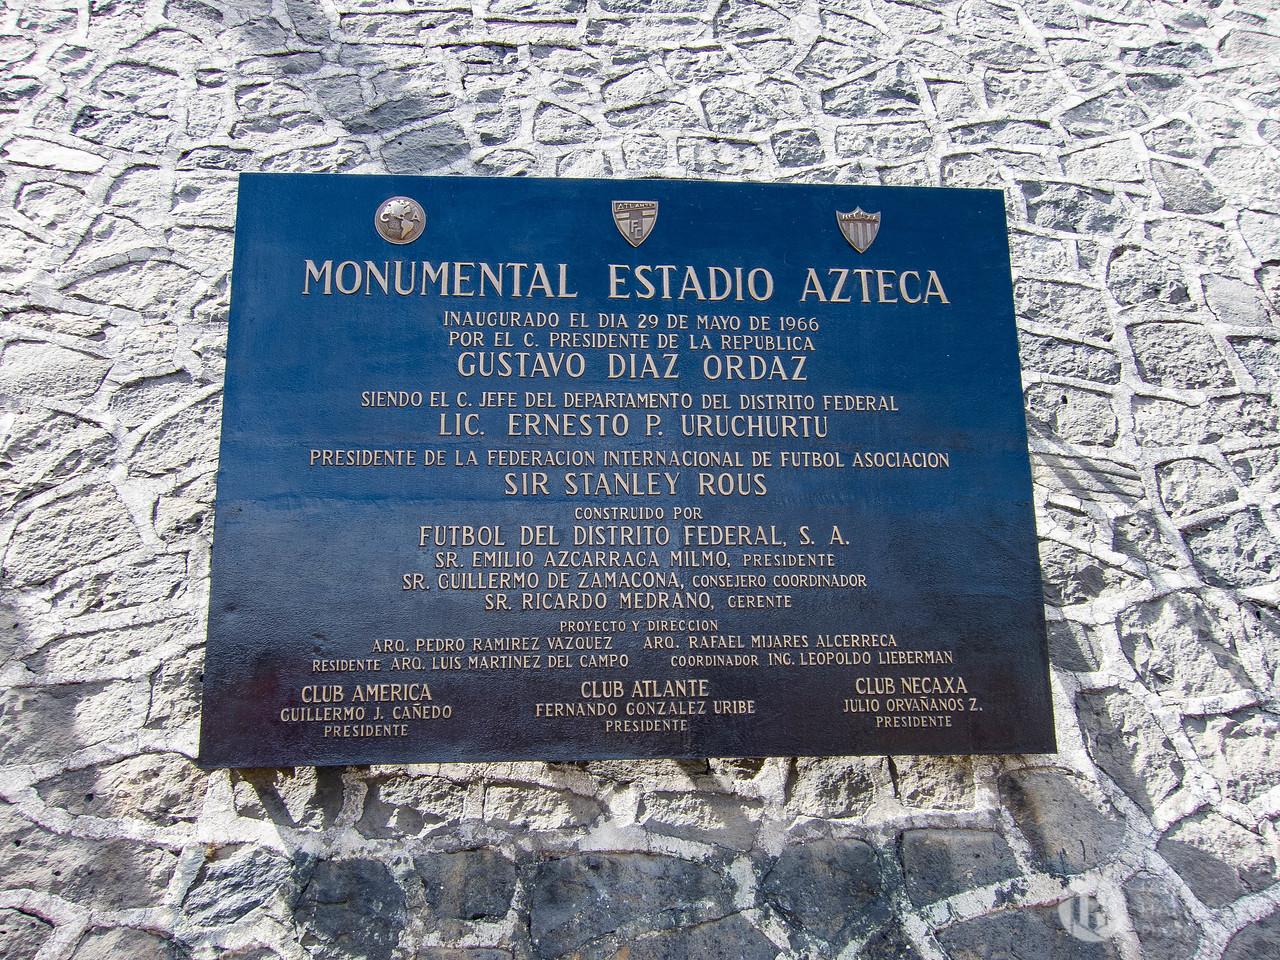 A Monumental Plaque